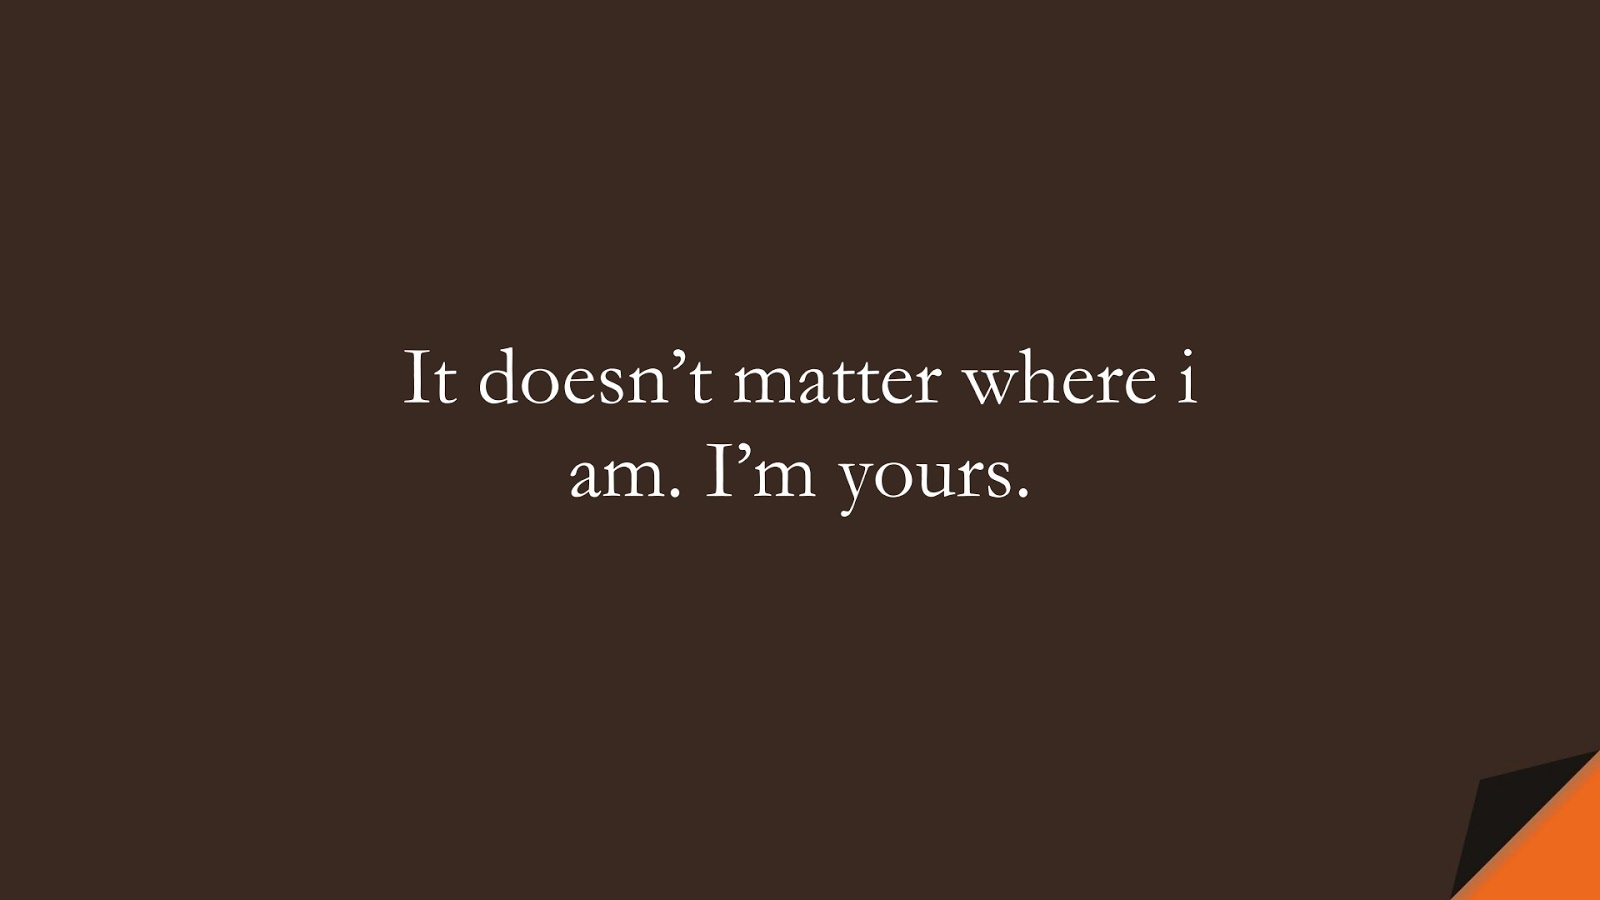 It doesn't matter where i am. I'm yours.FALSE